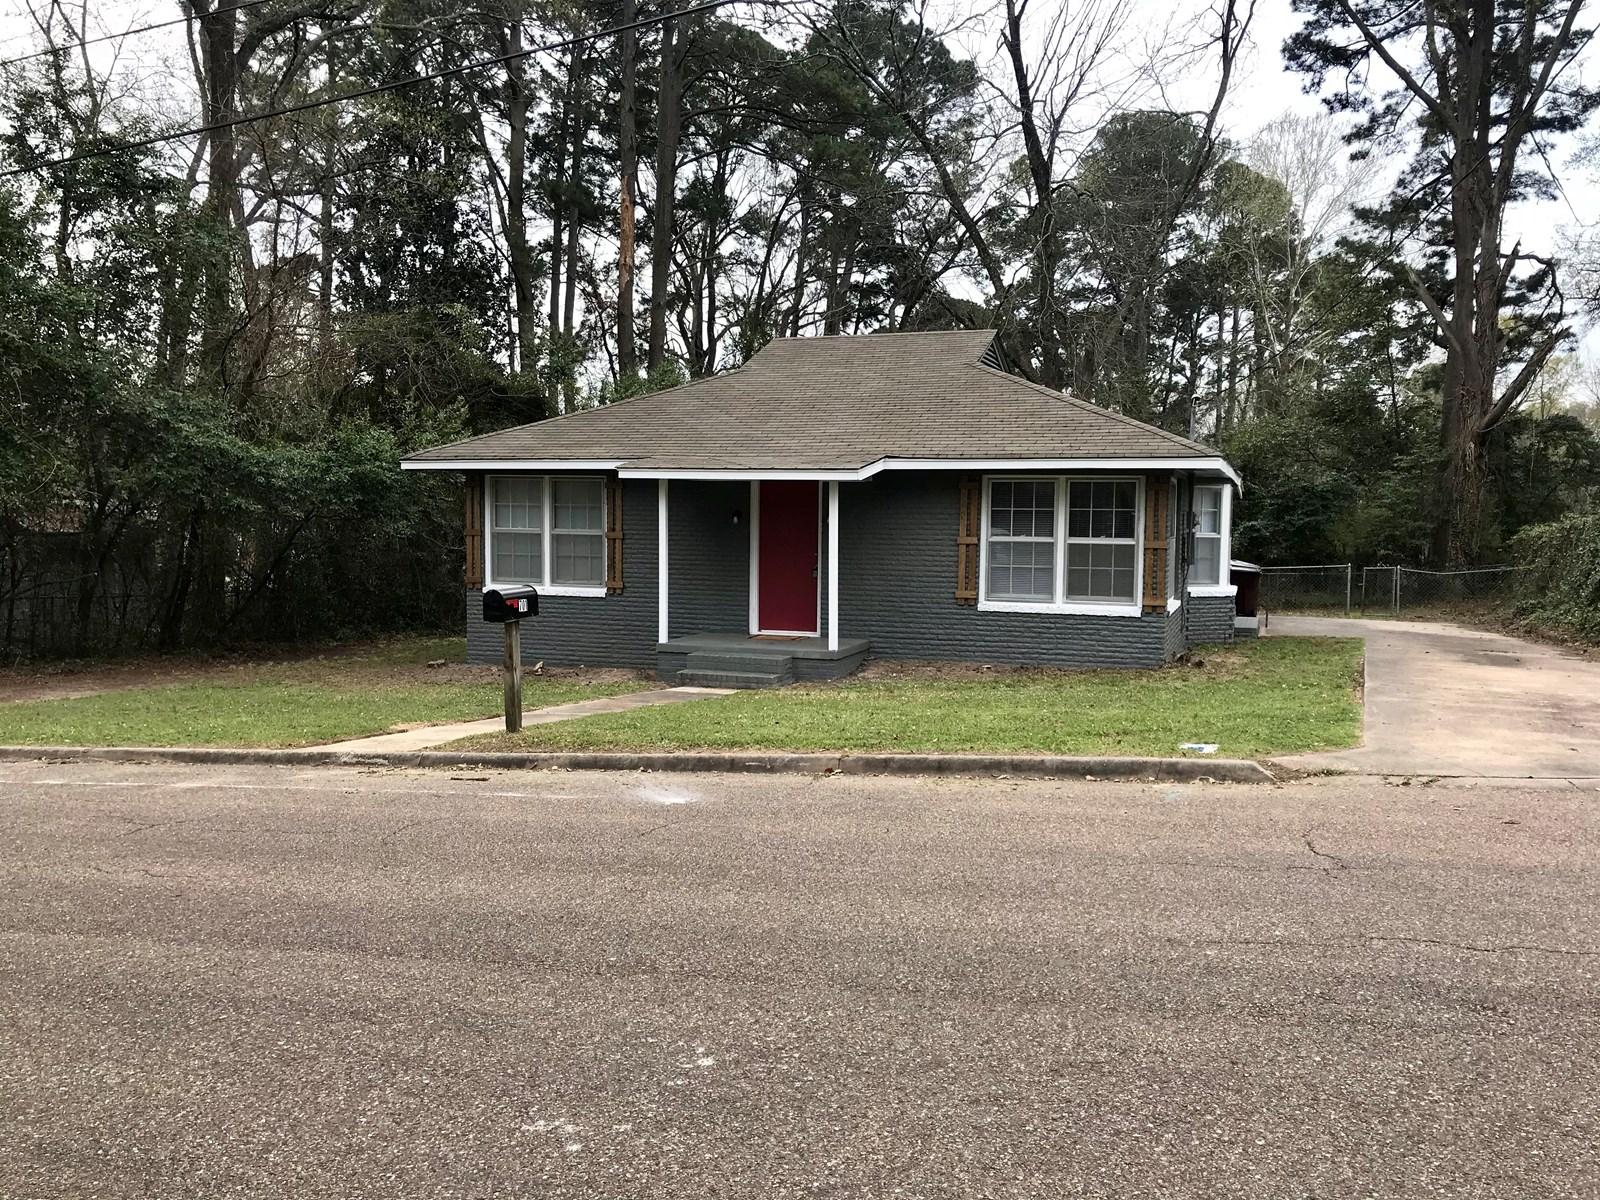 Brick Starter Home For Sale, Atlanta, Texas